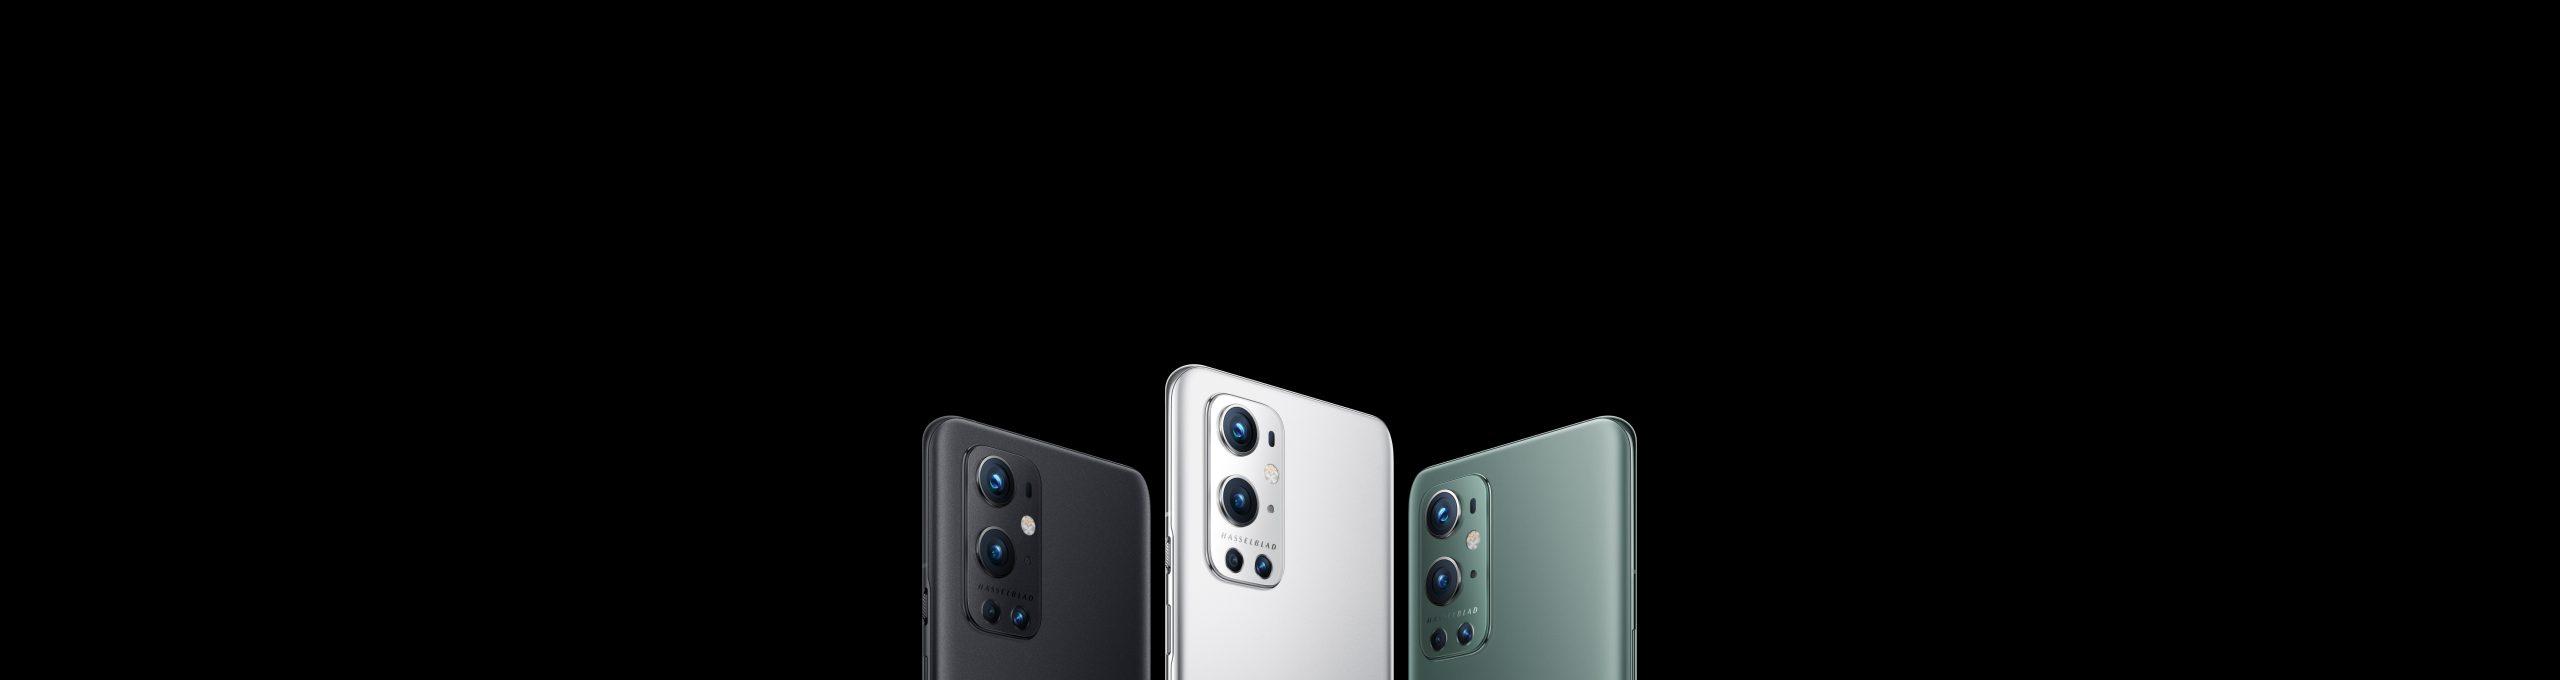 Colores del OnePlus 9 Pro: Verde, Negro y Plata